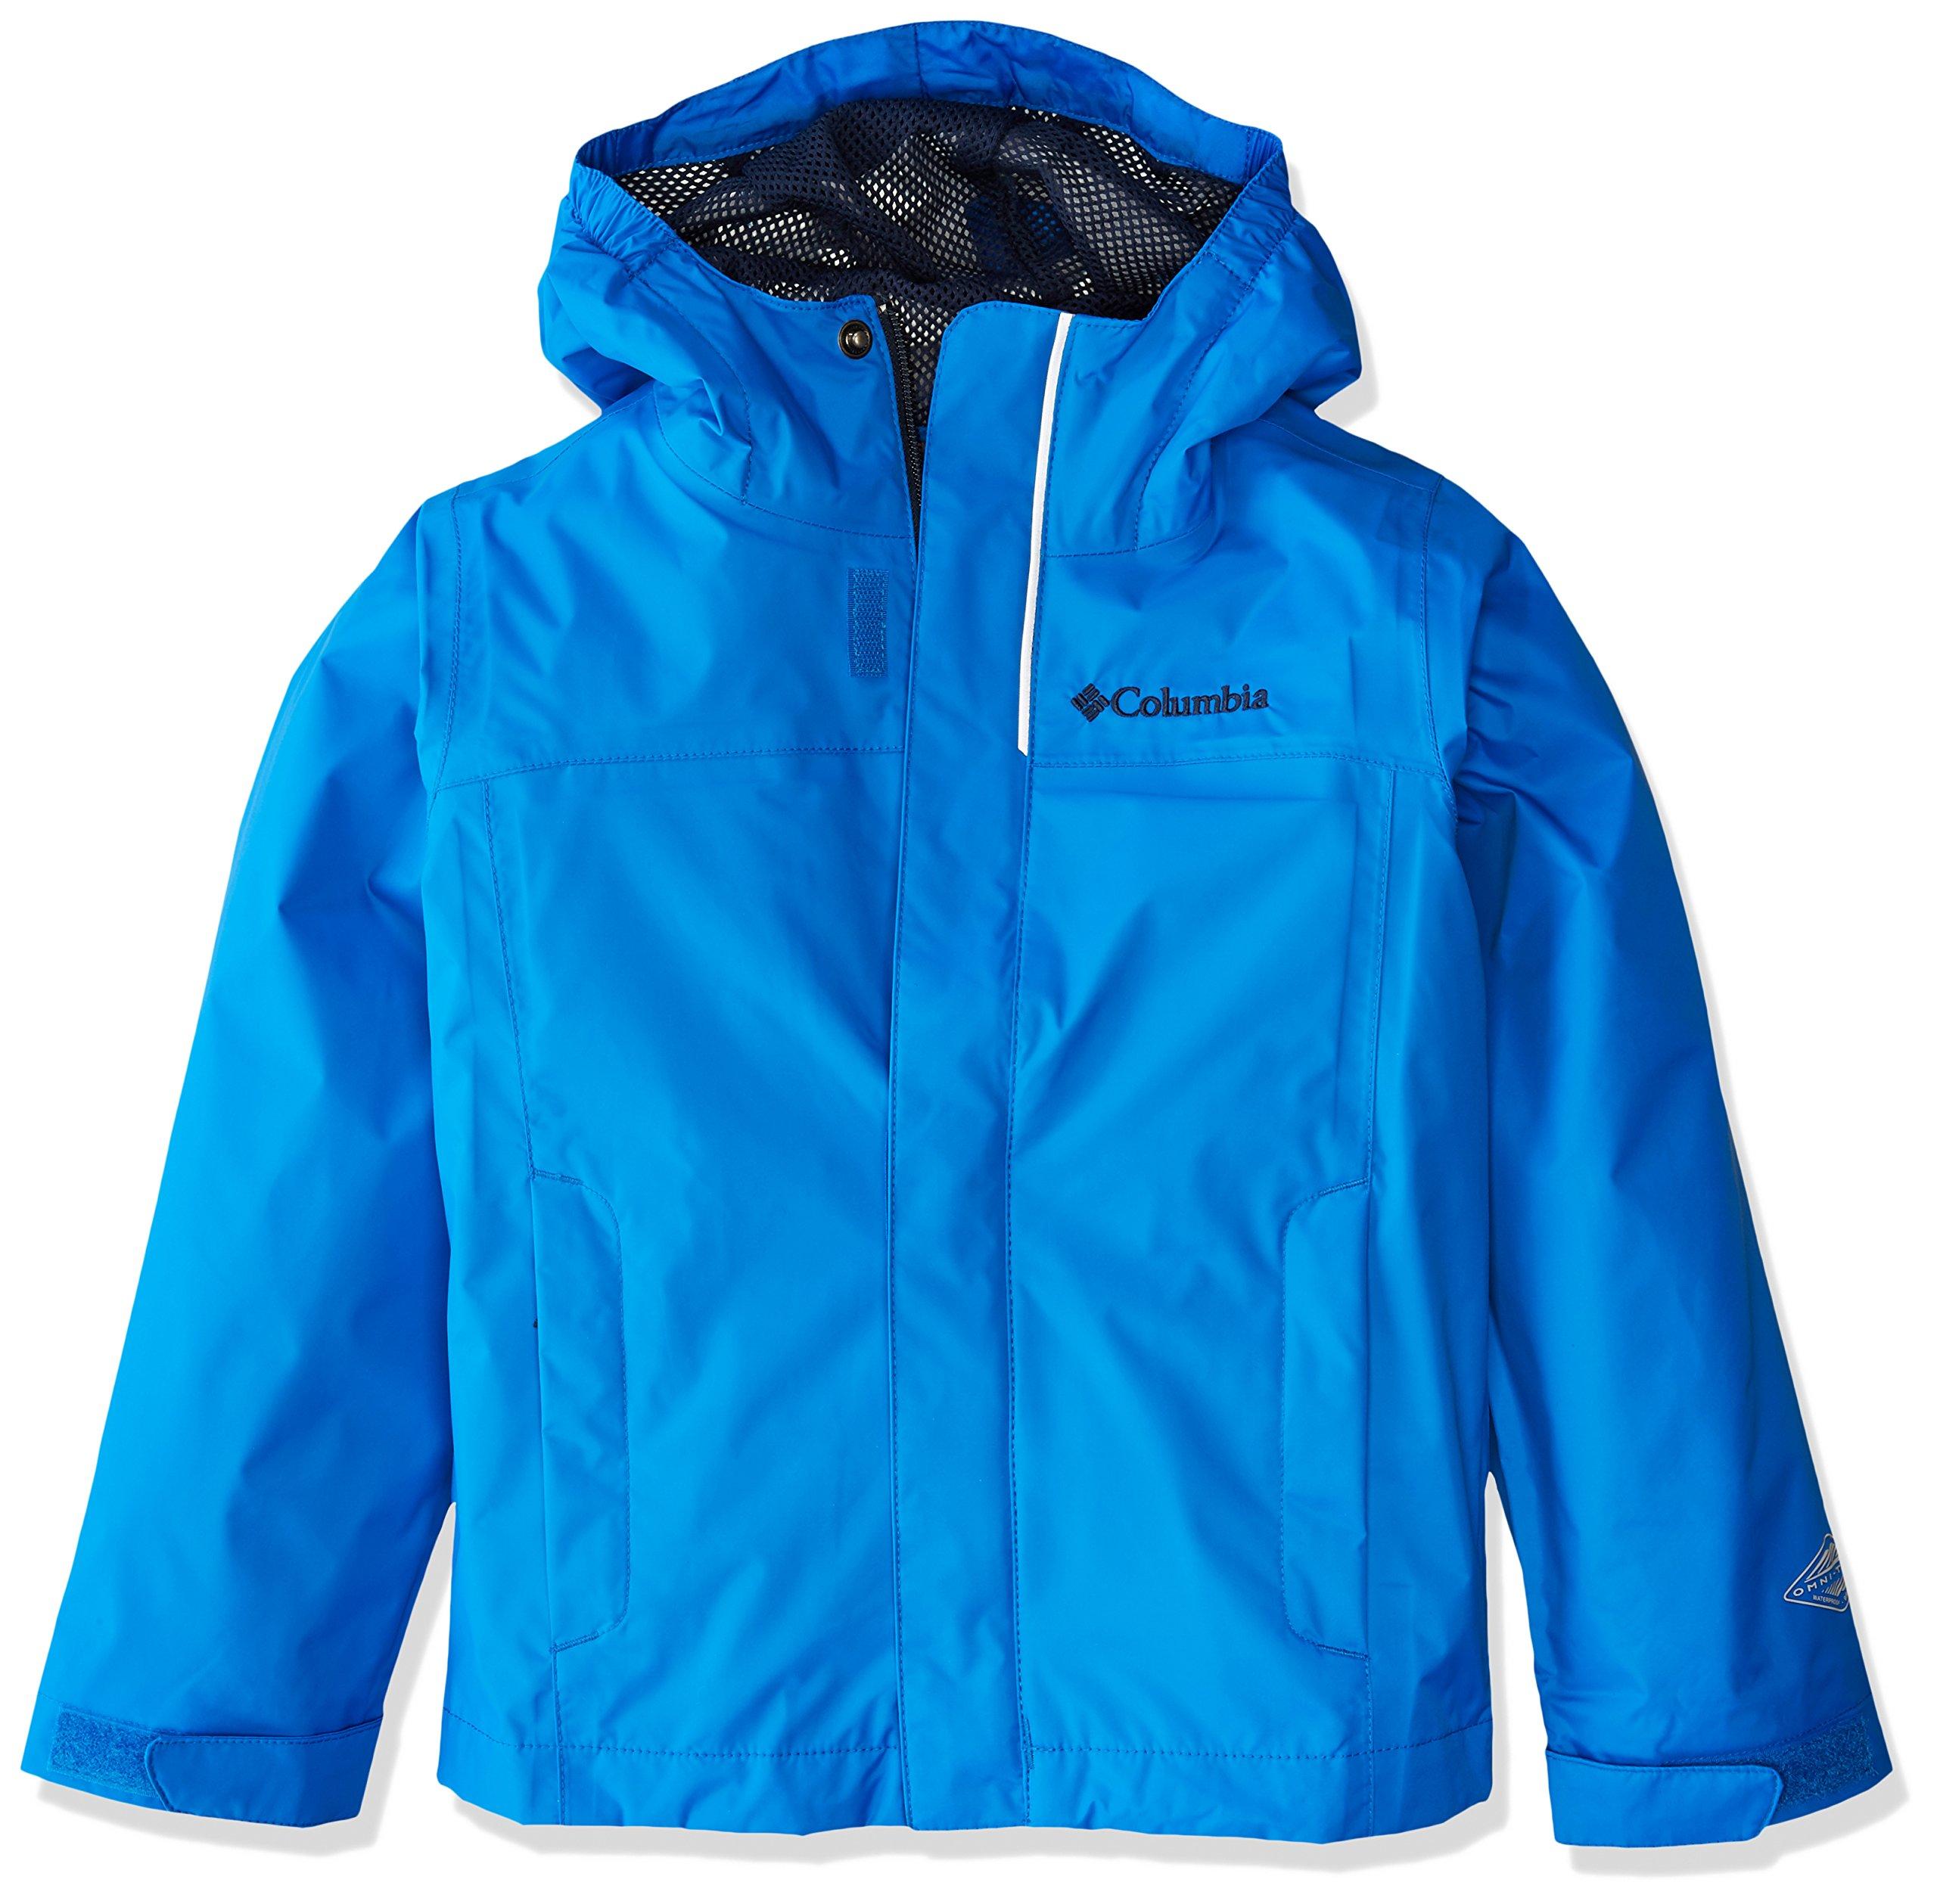 Columbia Big Boys' Watertight Jacket, Super Blue, XL